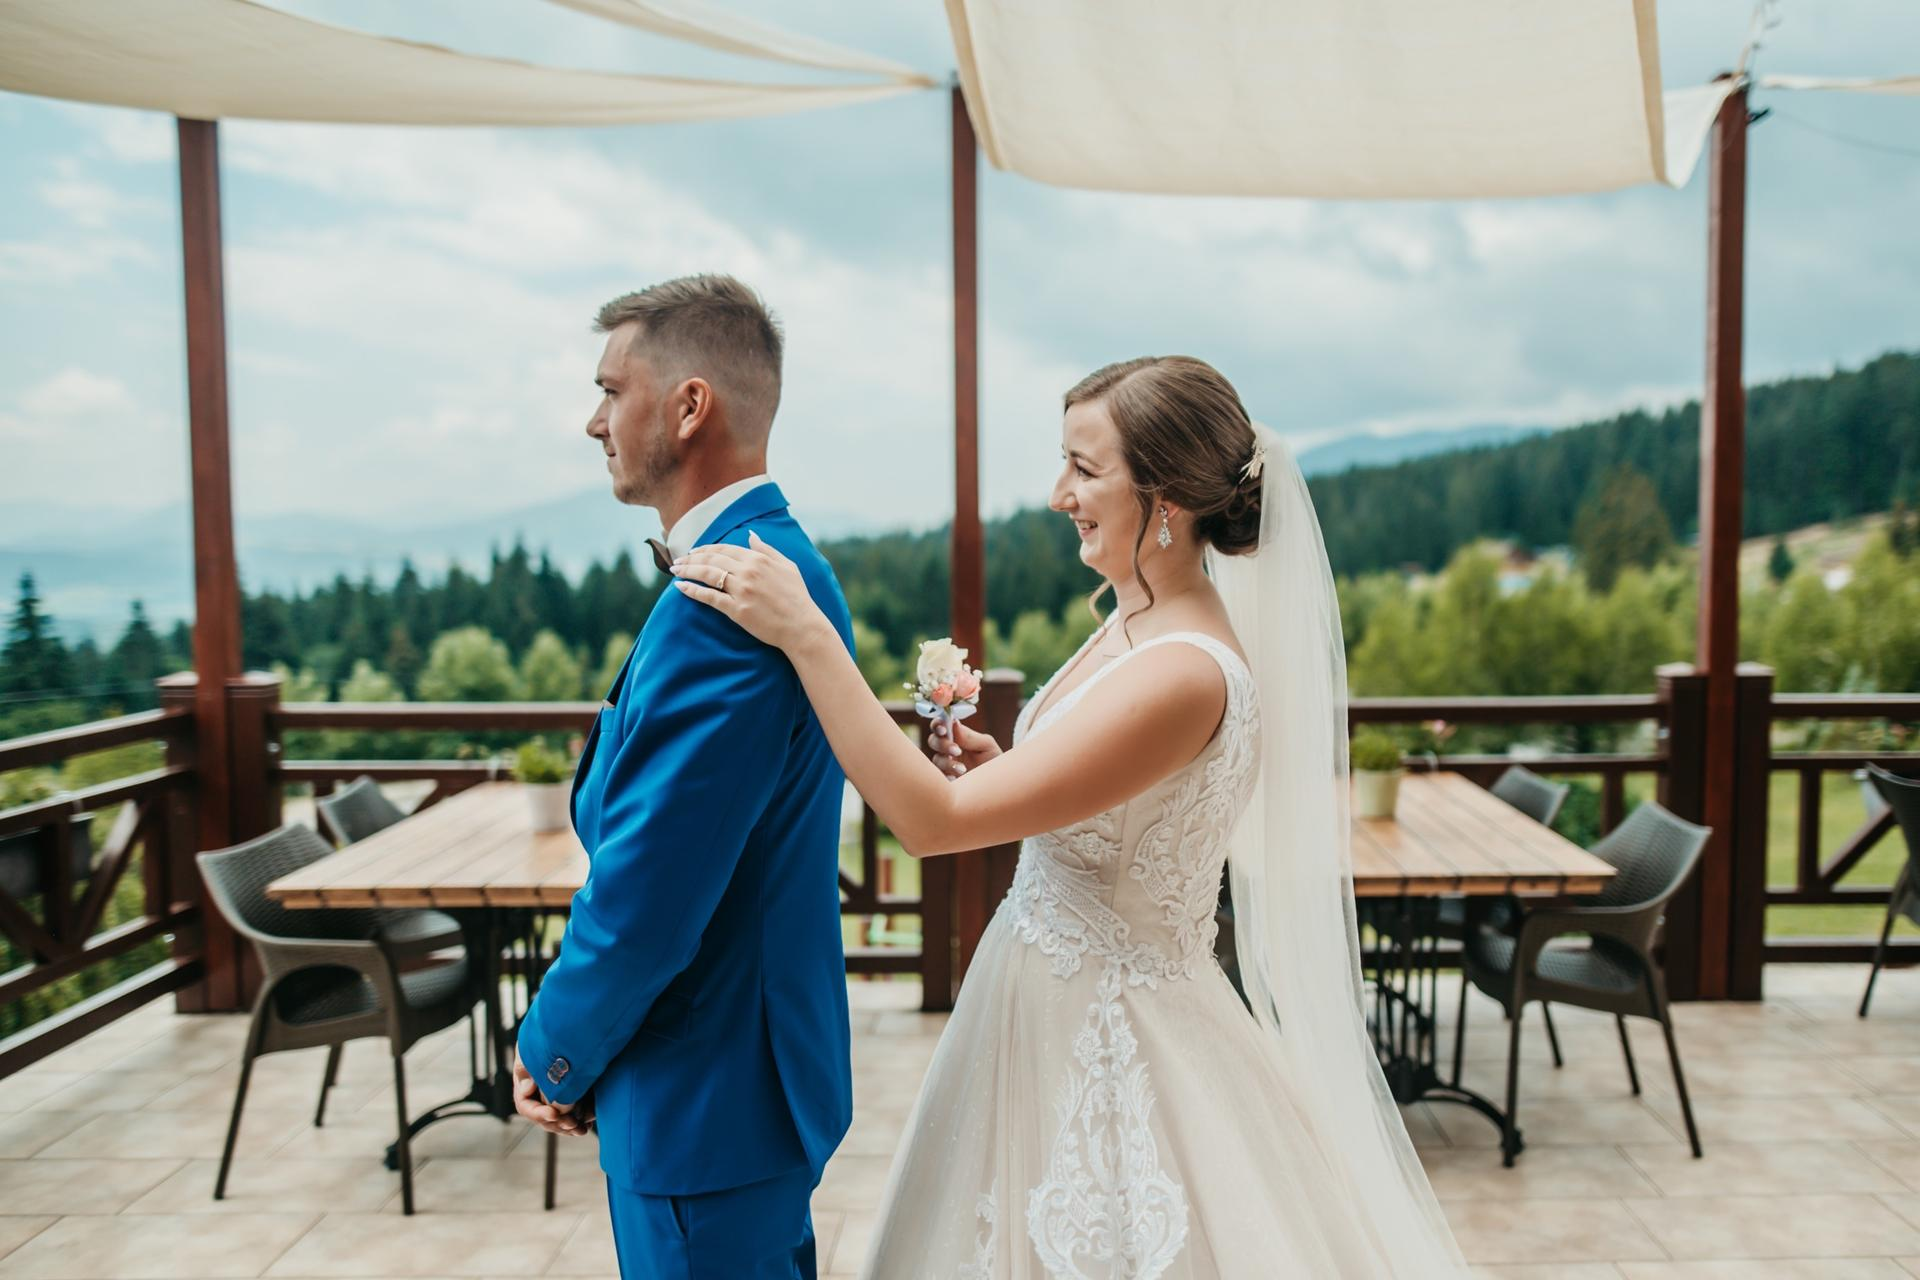 Our wedding ❤️ - Obrázok č. 2